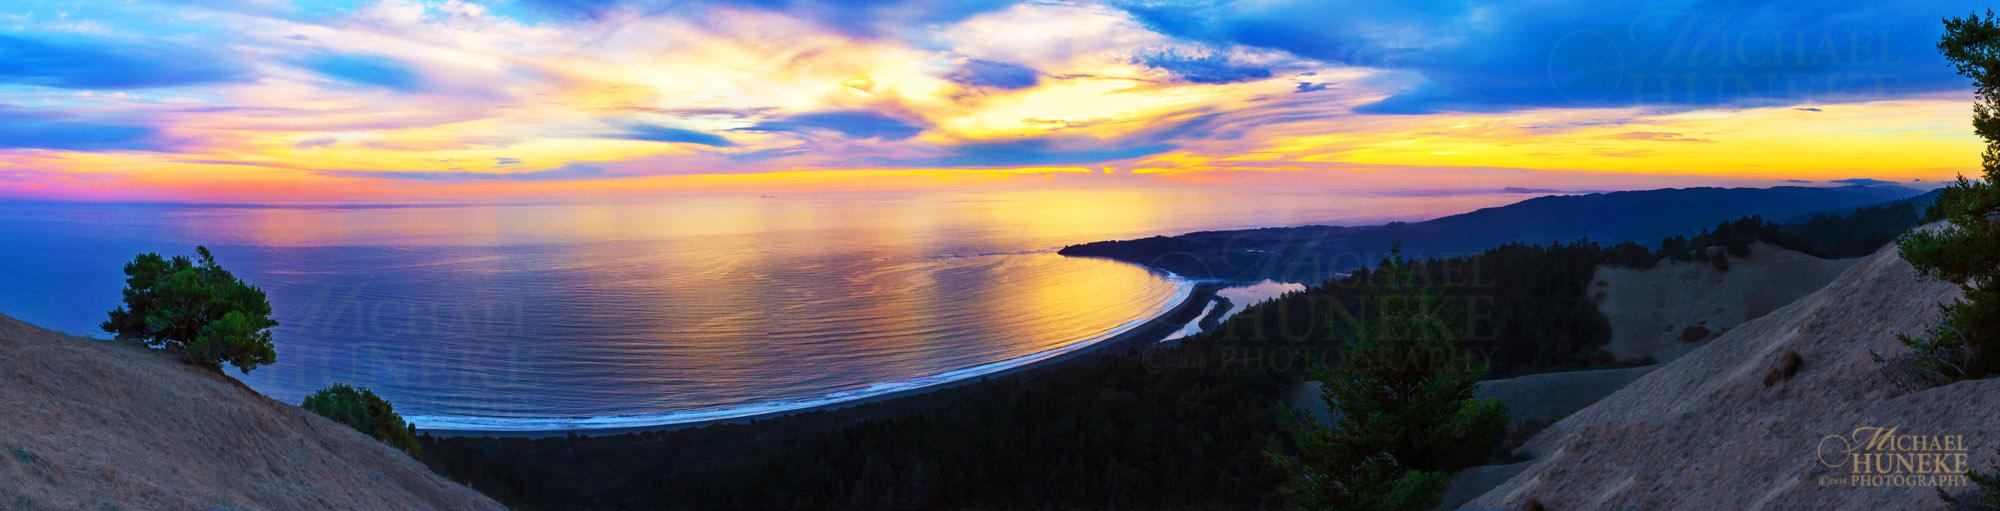 Ocean_Suset_Panorama 2000 wide 72dpi high(9) wm.jpg